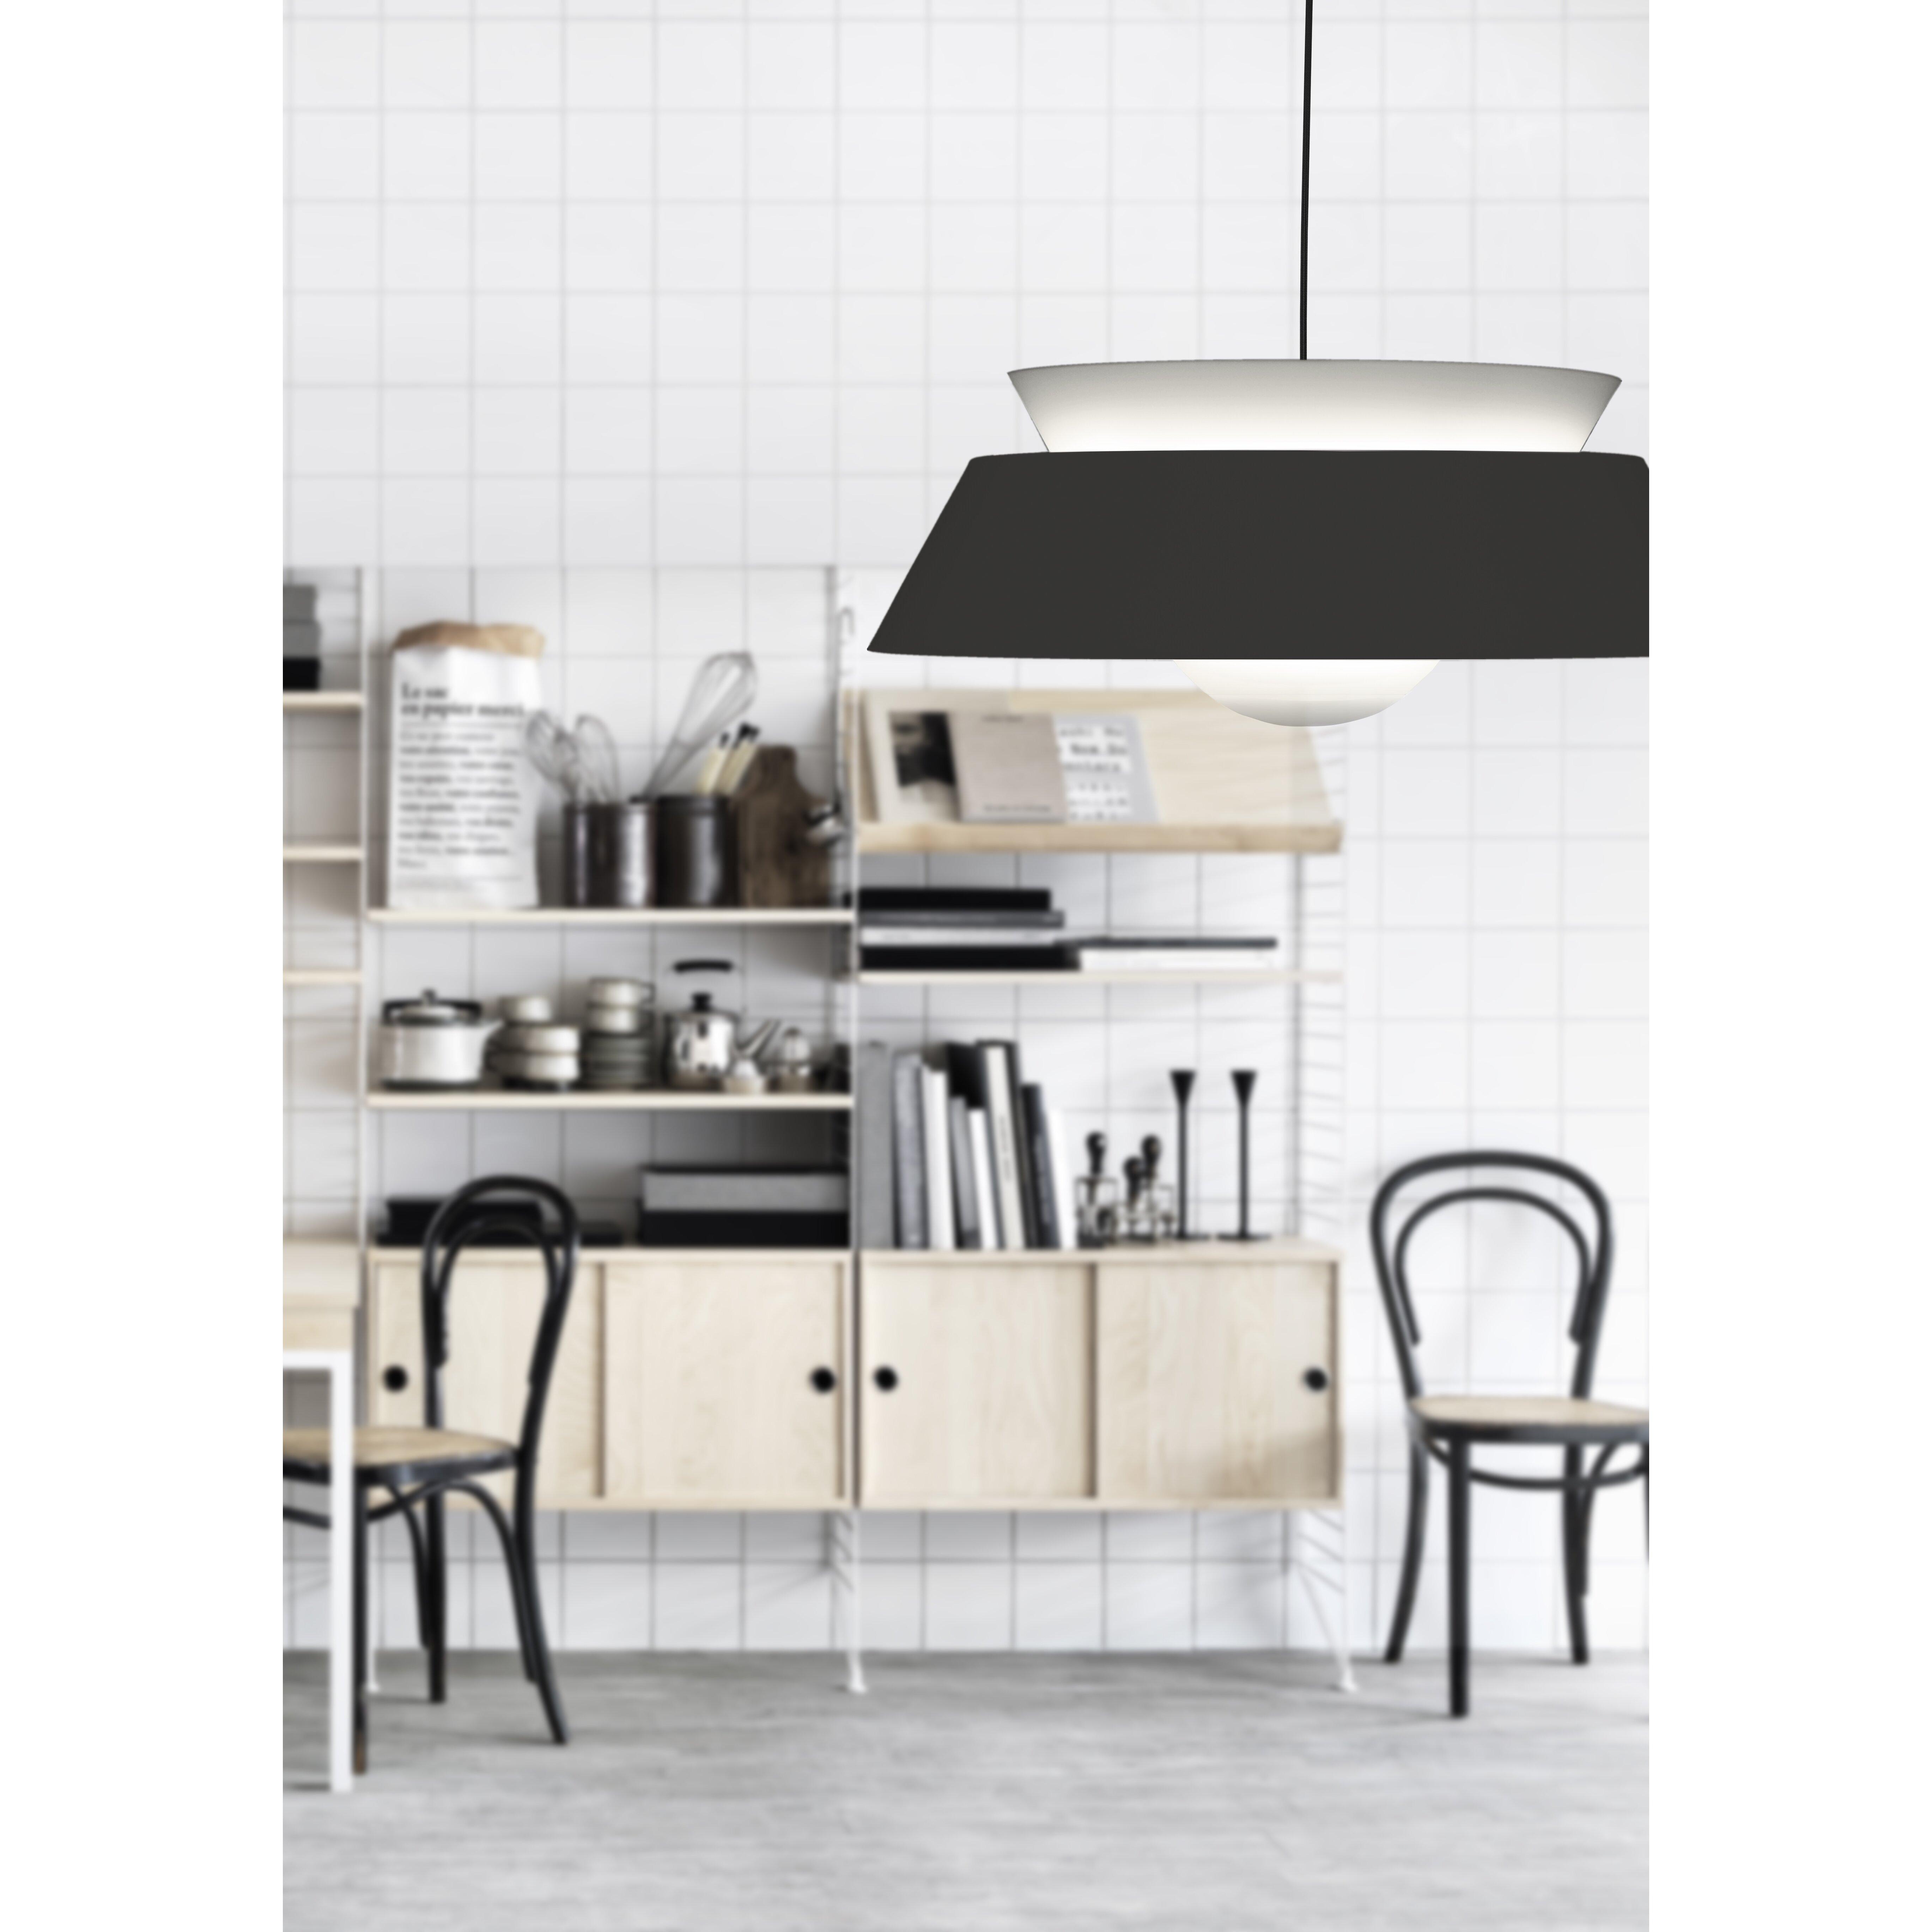 vita copenhagen cuna 1 light pendant reviews wayfair. Black Bedroom Furniture Sets. Home Design Ideas